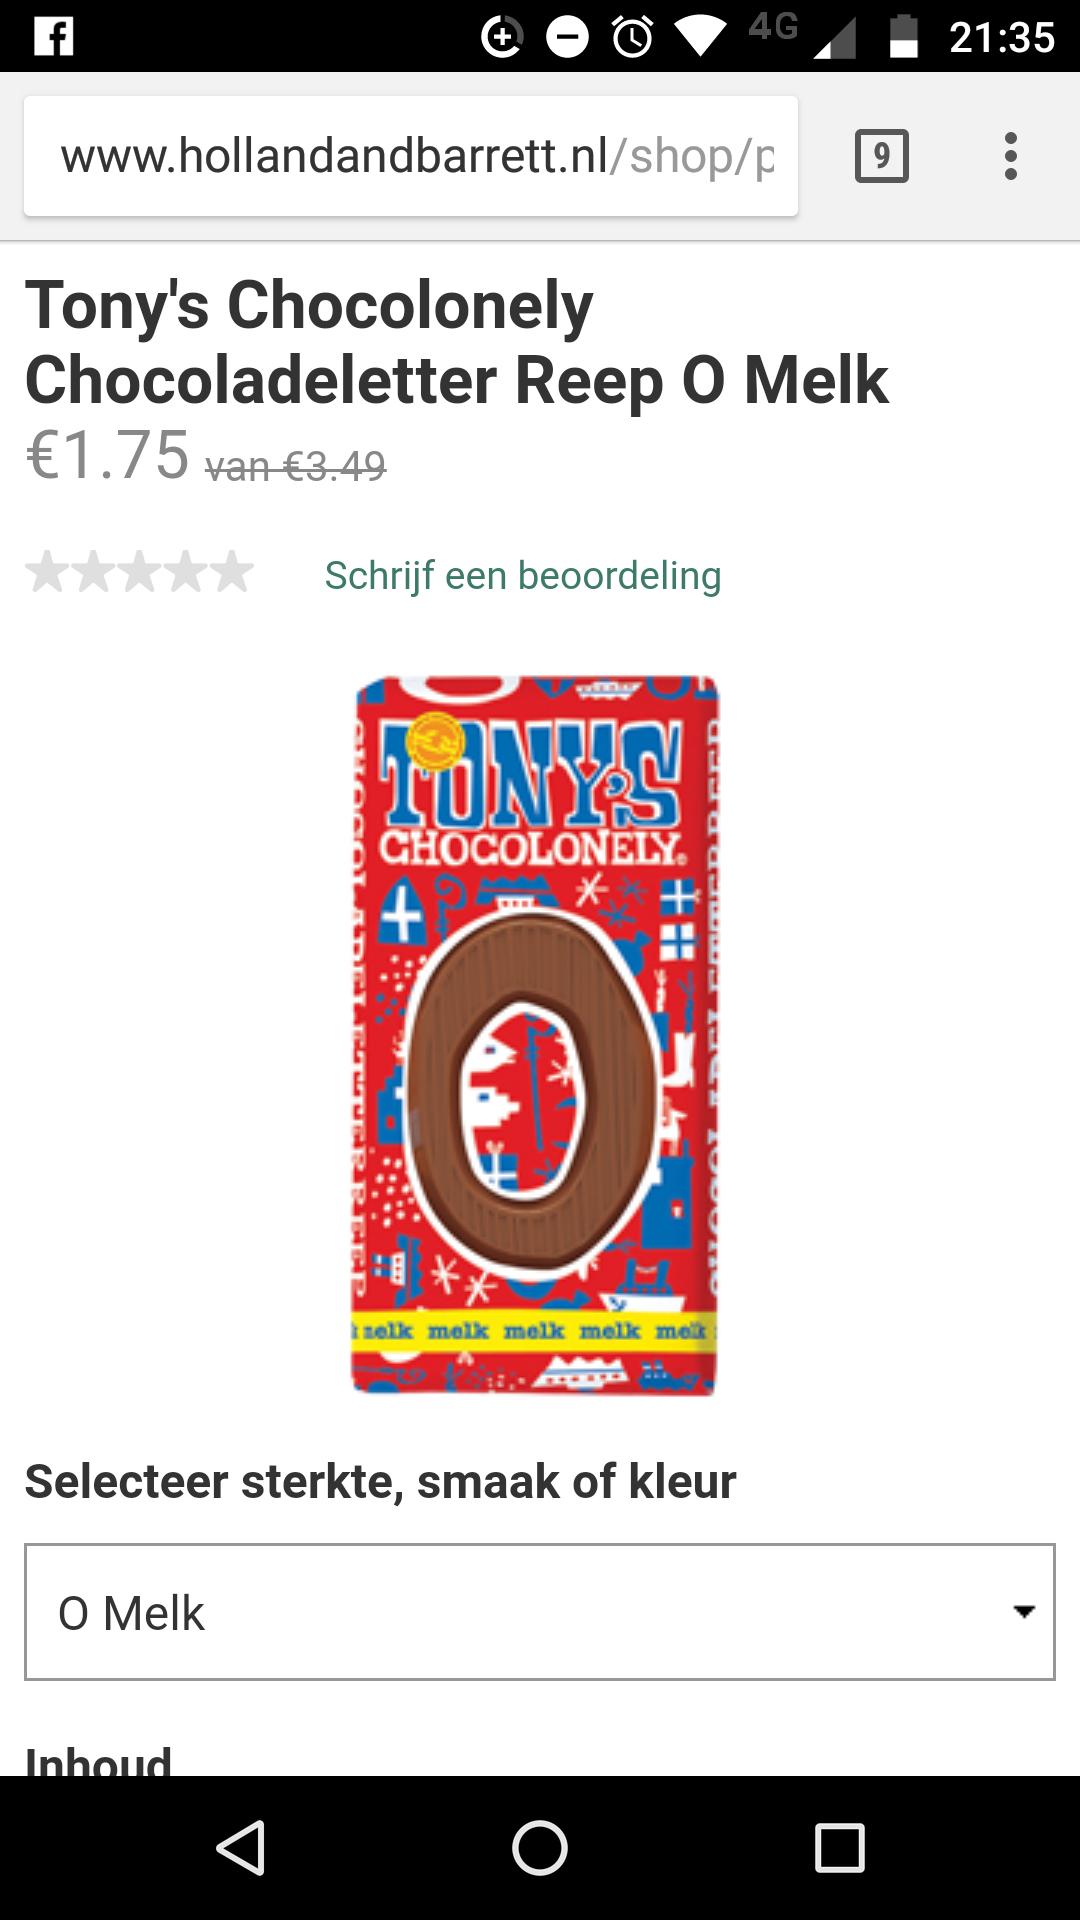 Tony's chocolade letter reep melk/puur voor 1,75 @ Holland Barret